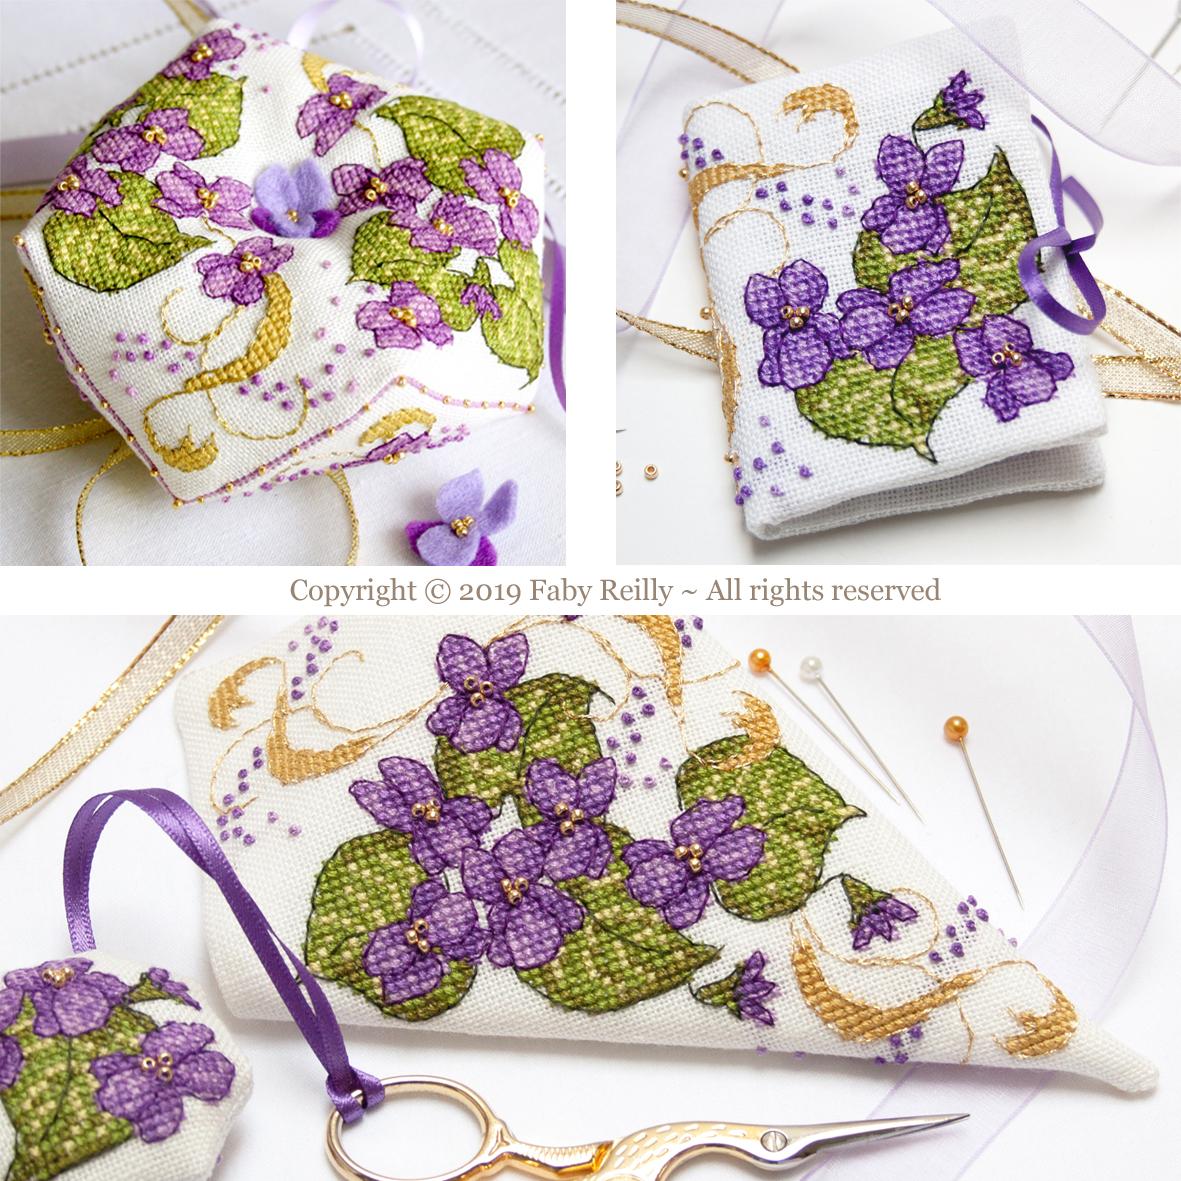 buy online 77cef 0c579 Violet Stitching Set - Faby Reilly Designs